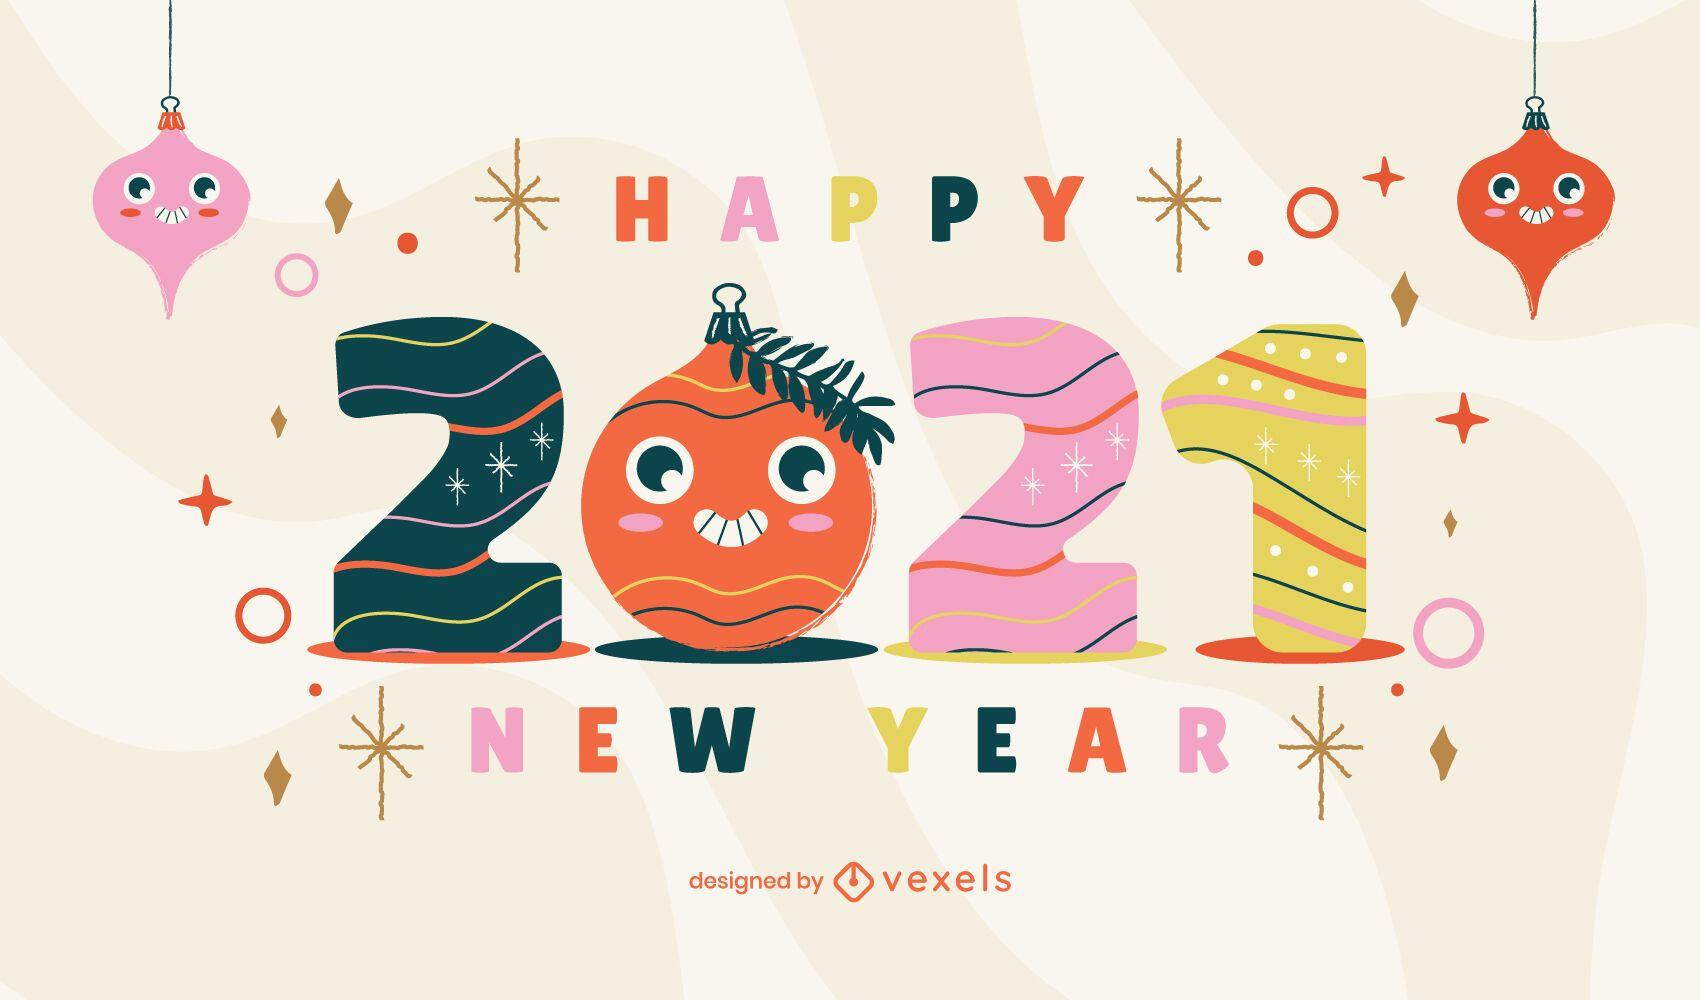 2021 new year illustration design